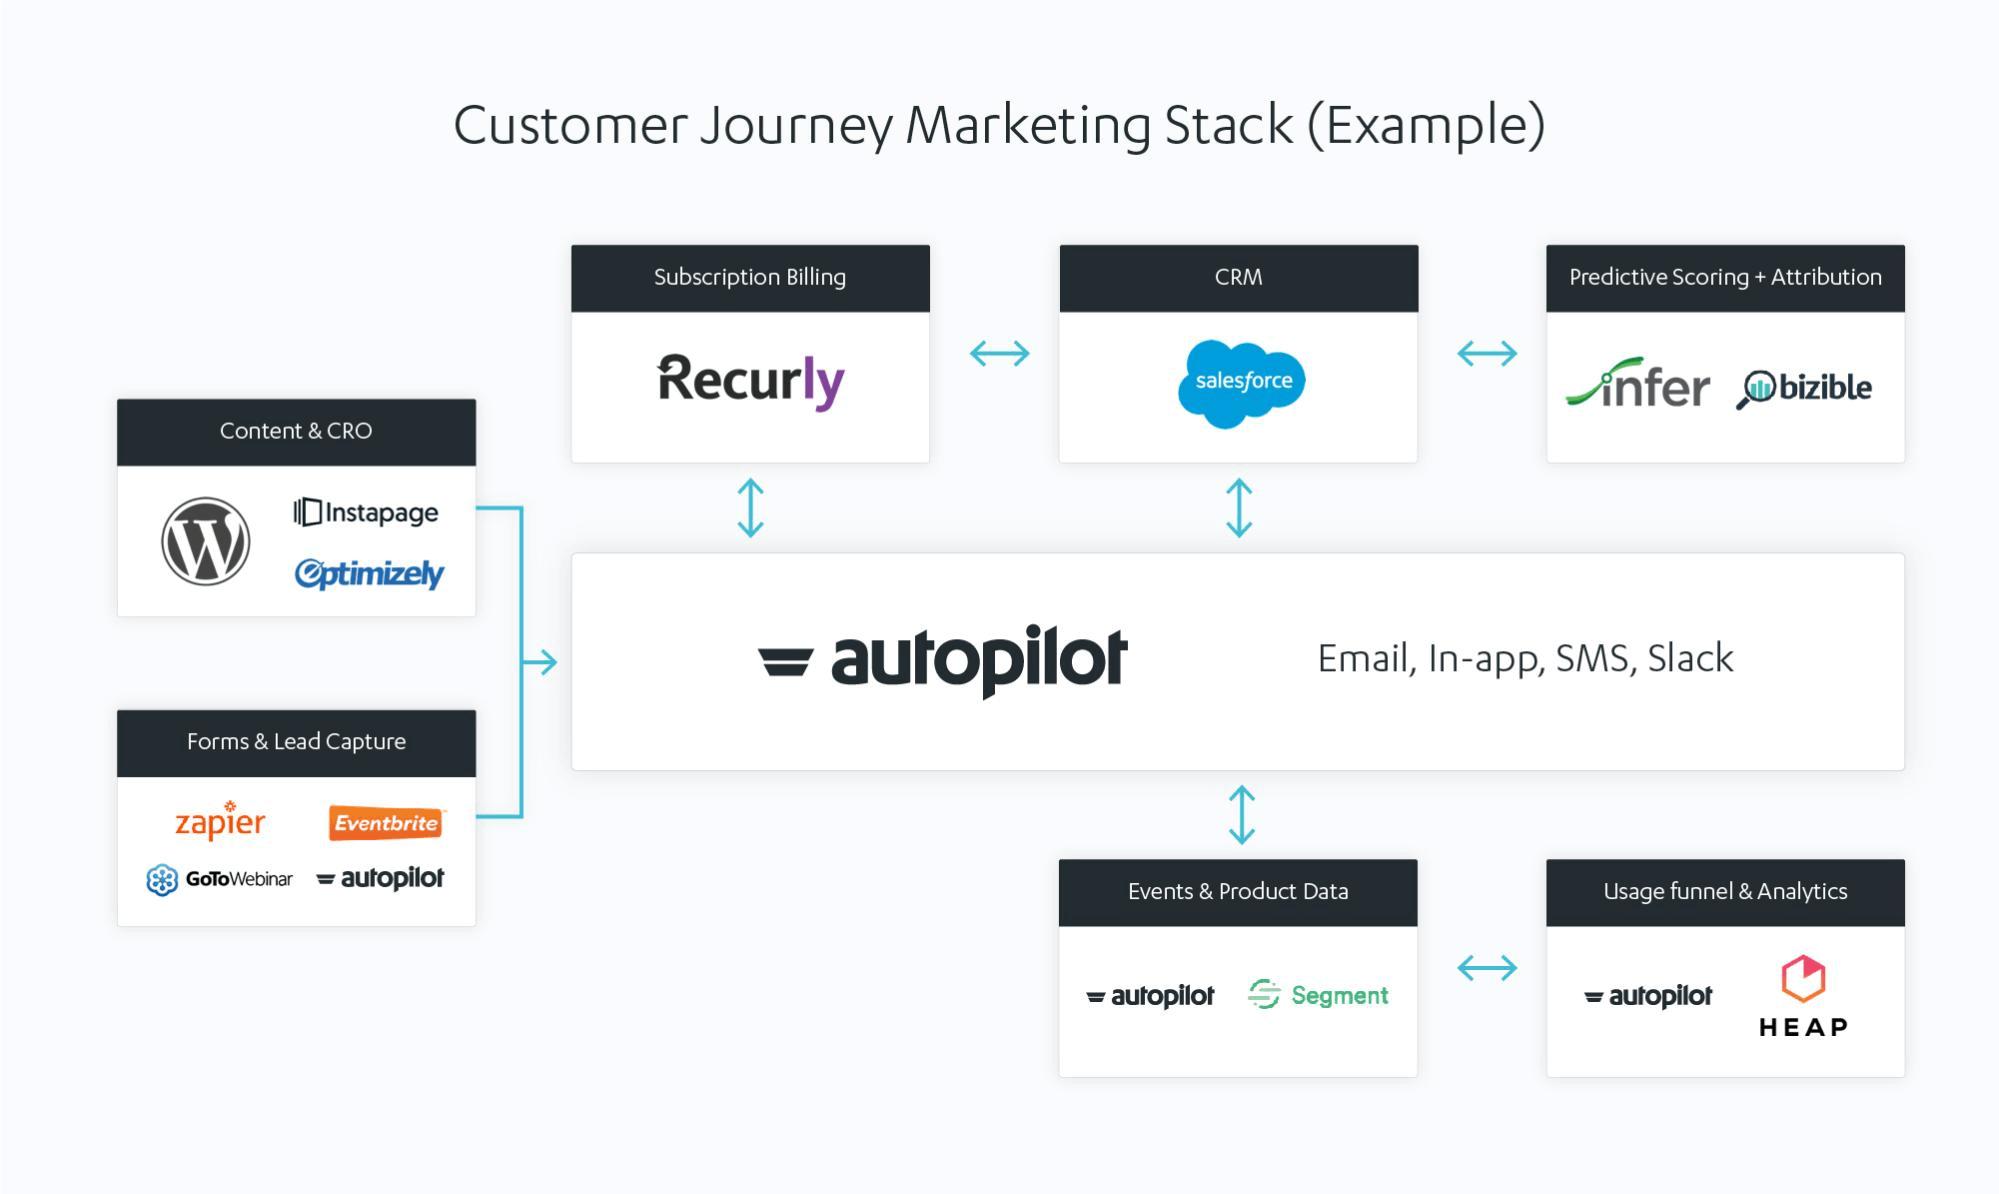 autopilot customer journey marketing stack